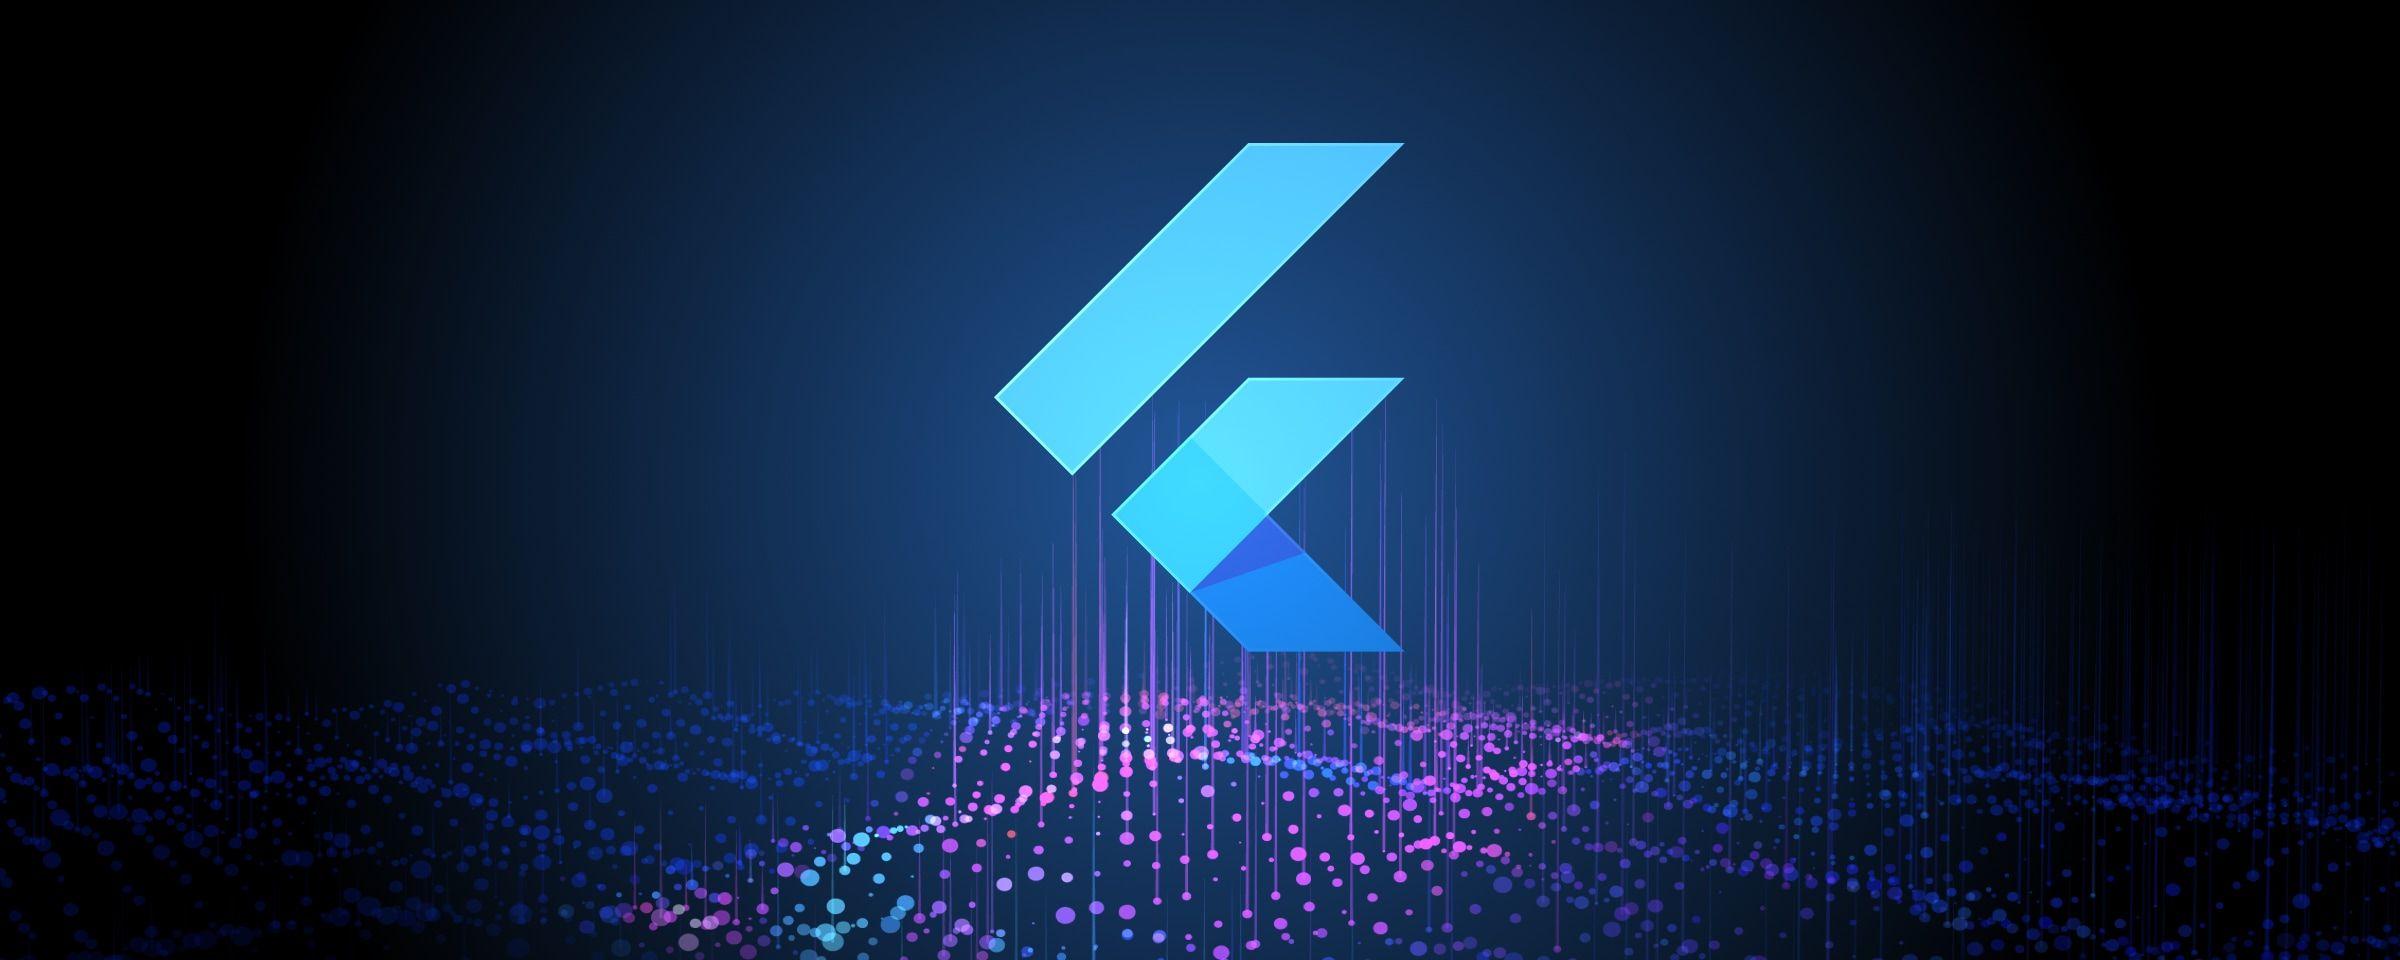 flutter linux google canonical